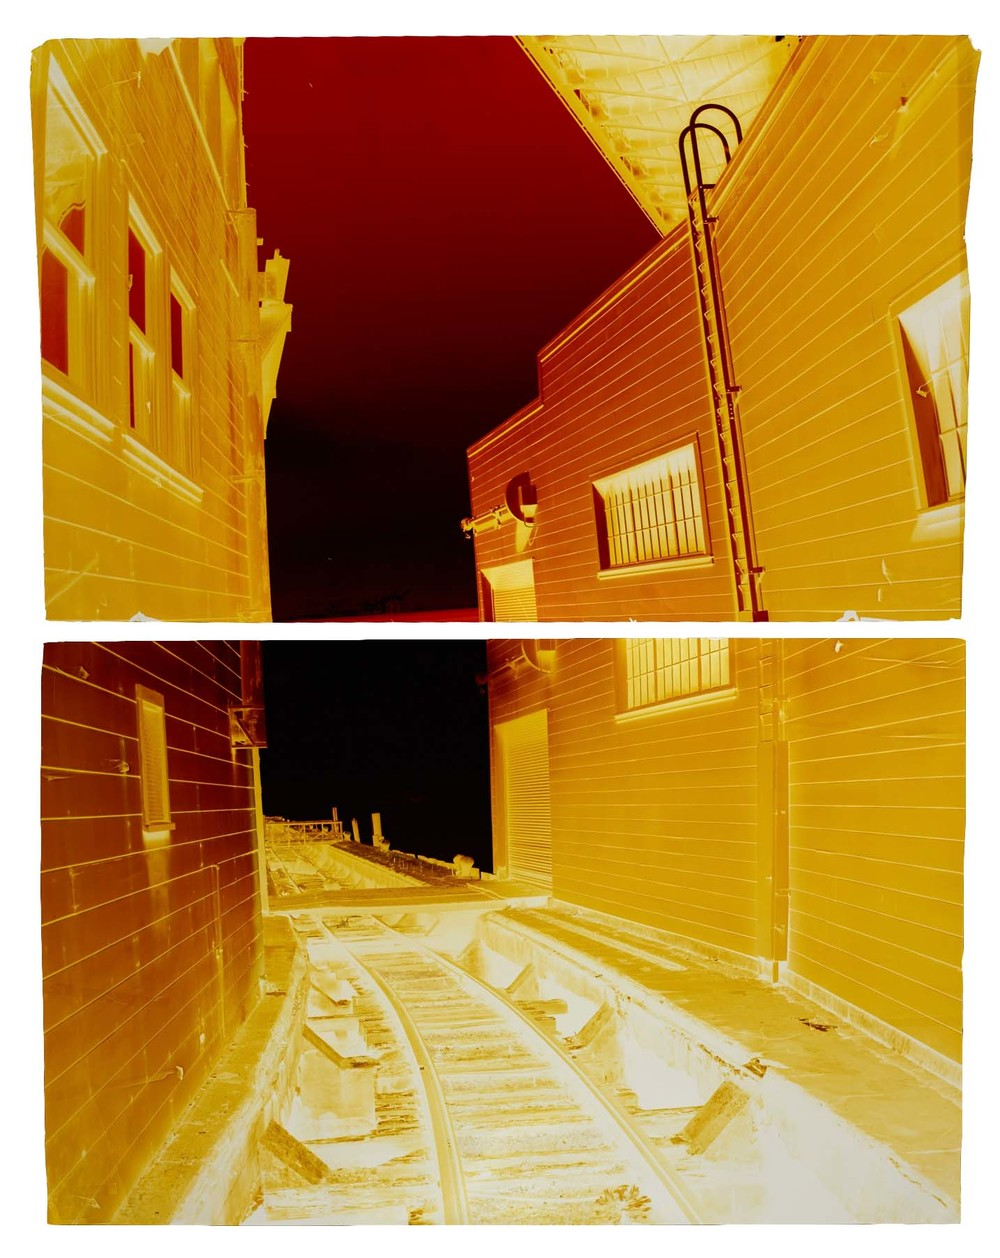 Embarcadero at Interstate 80, Variation B, 2013 Camera Obscura Ilfrochrome Photograph, Unique | 50 x 75 inches | HG12073